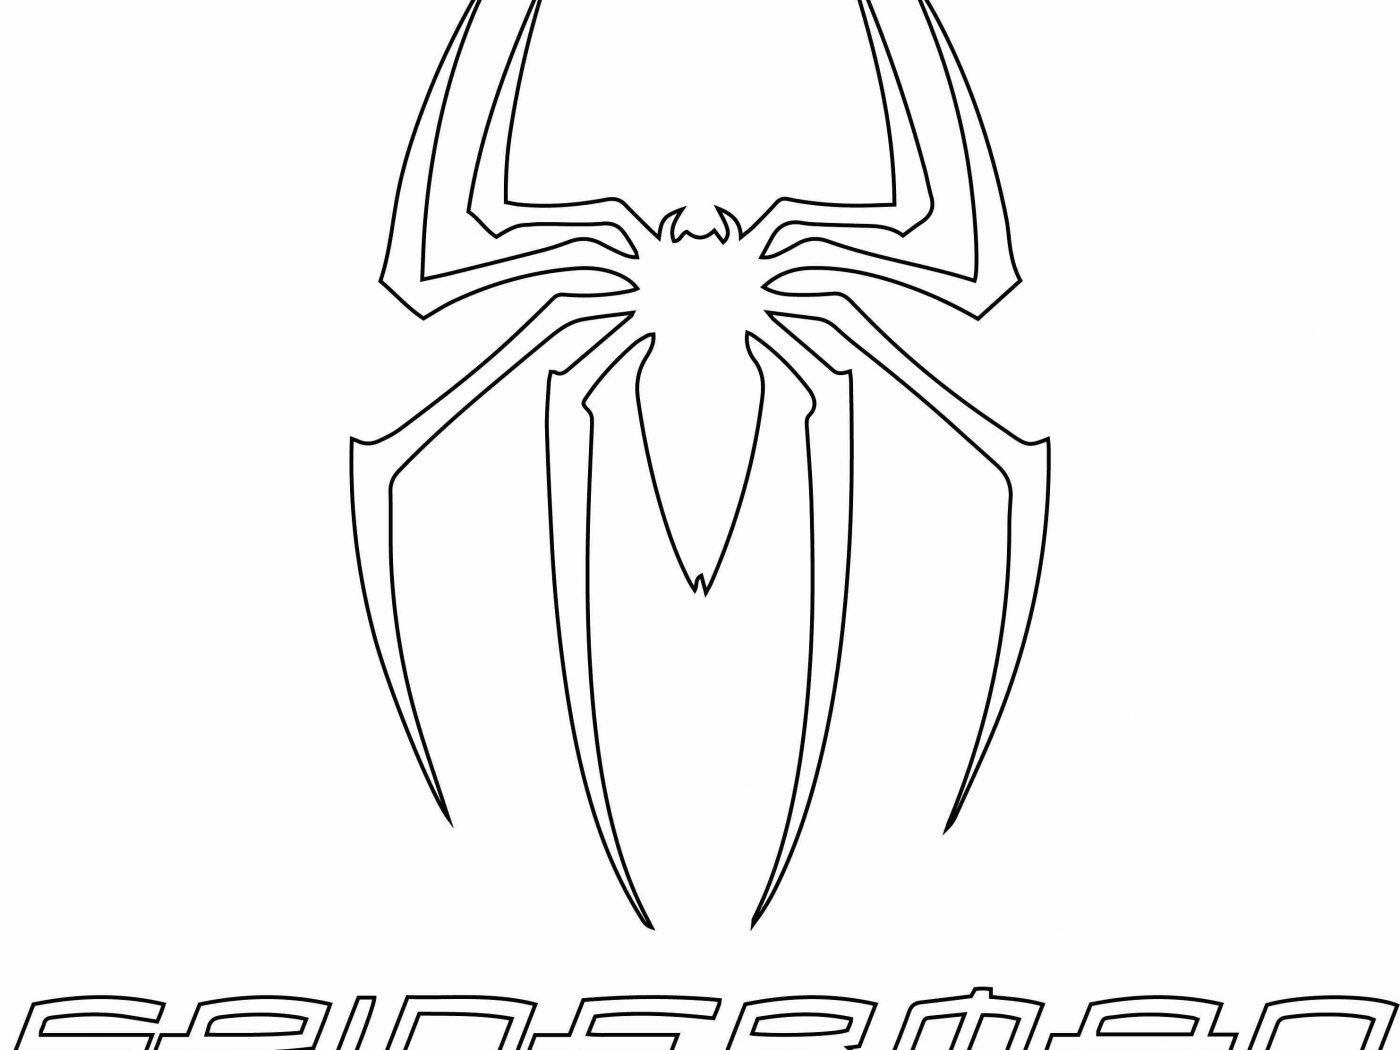 1400x1050 Batman Vs Superman Symbol Coloring Pages And Logo Free Color